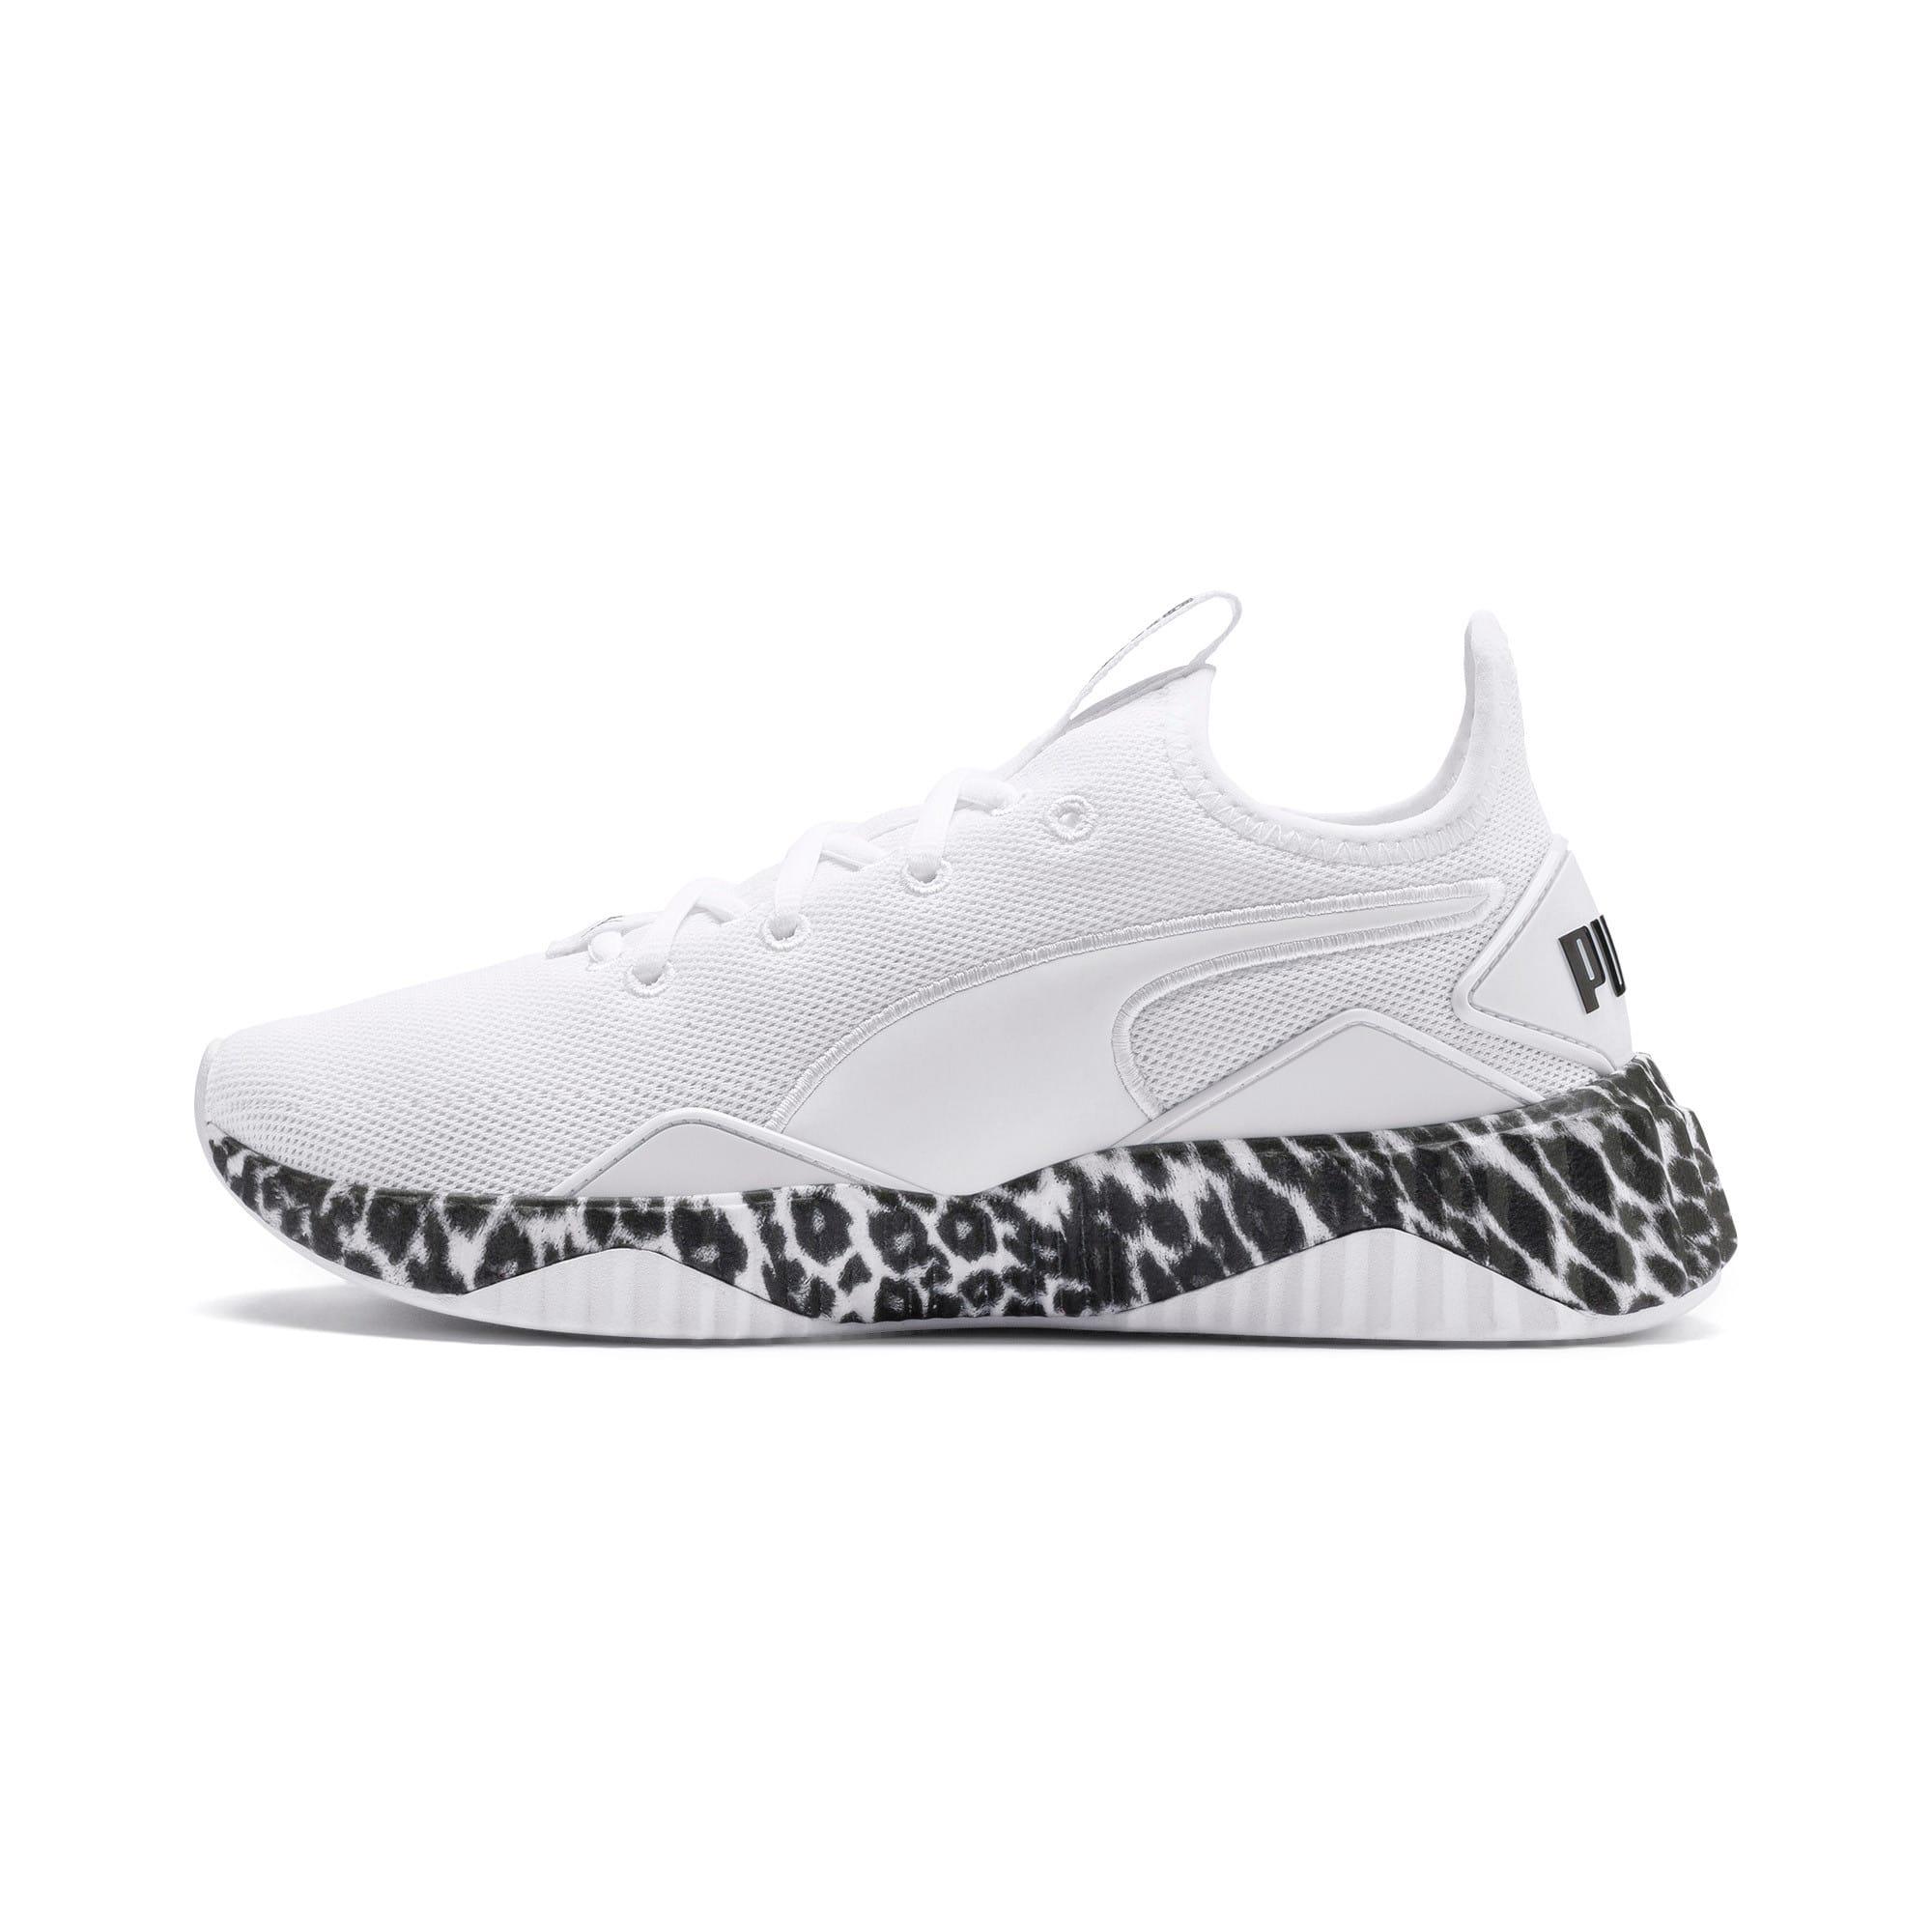 Thumbnail 1 of Defy Leopard Women's Sneakers, Puma White-Puma Black, medium